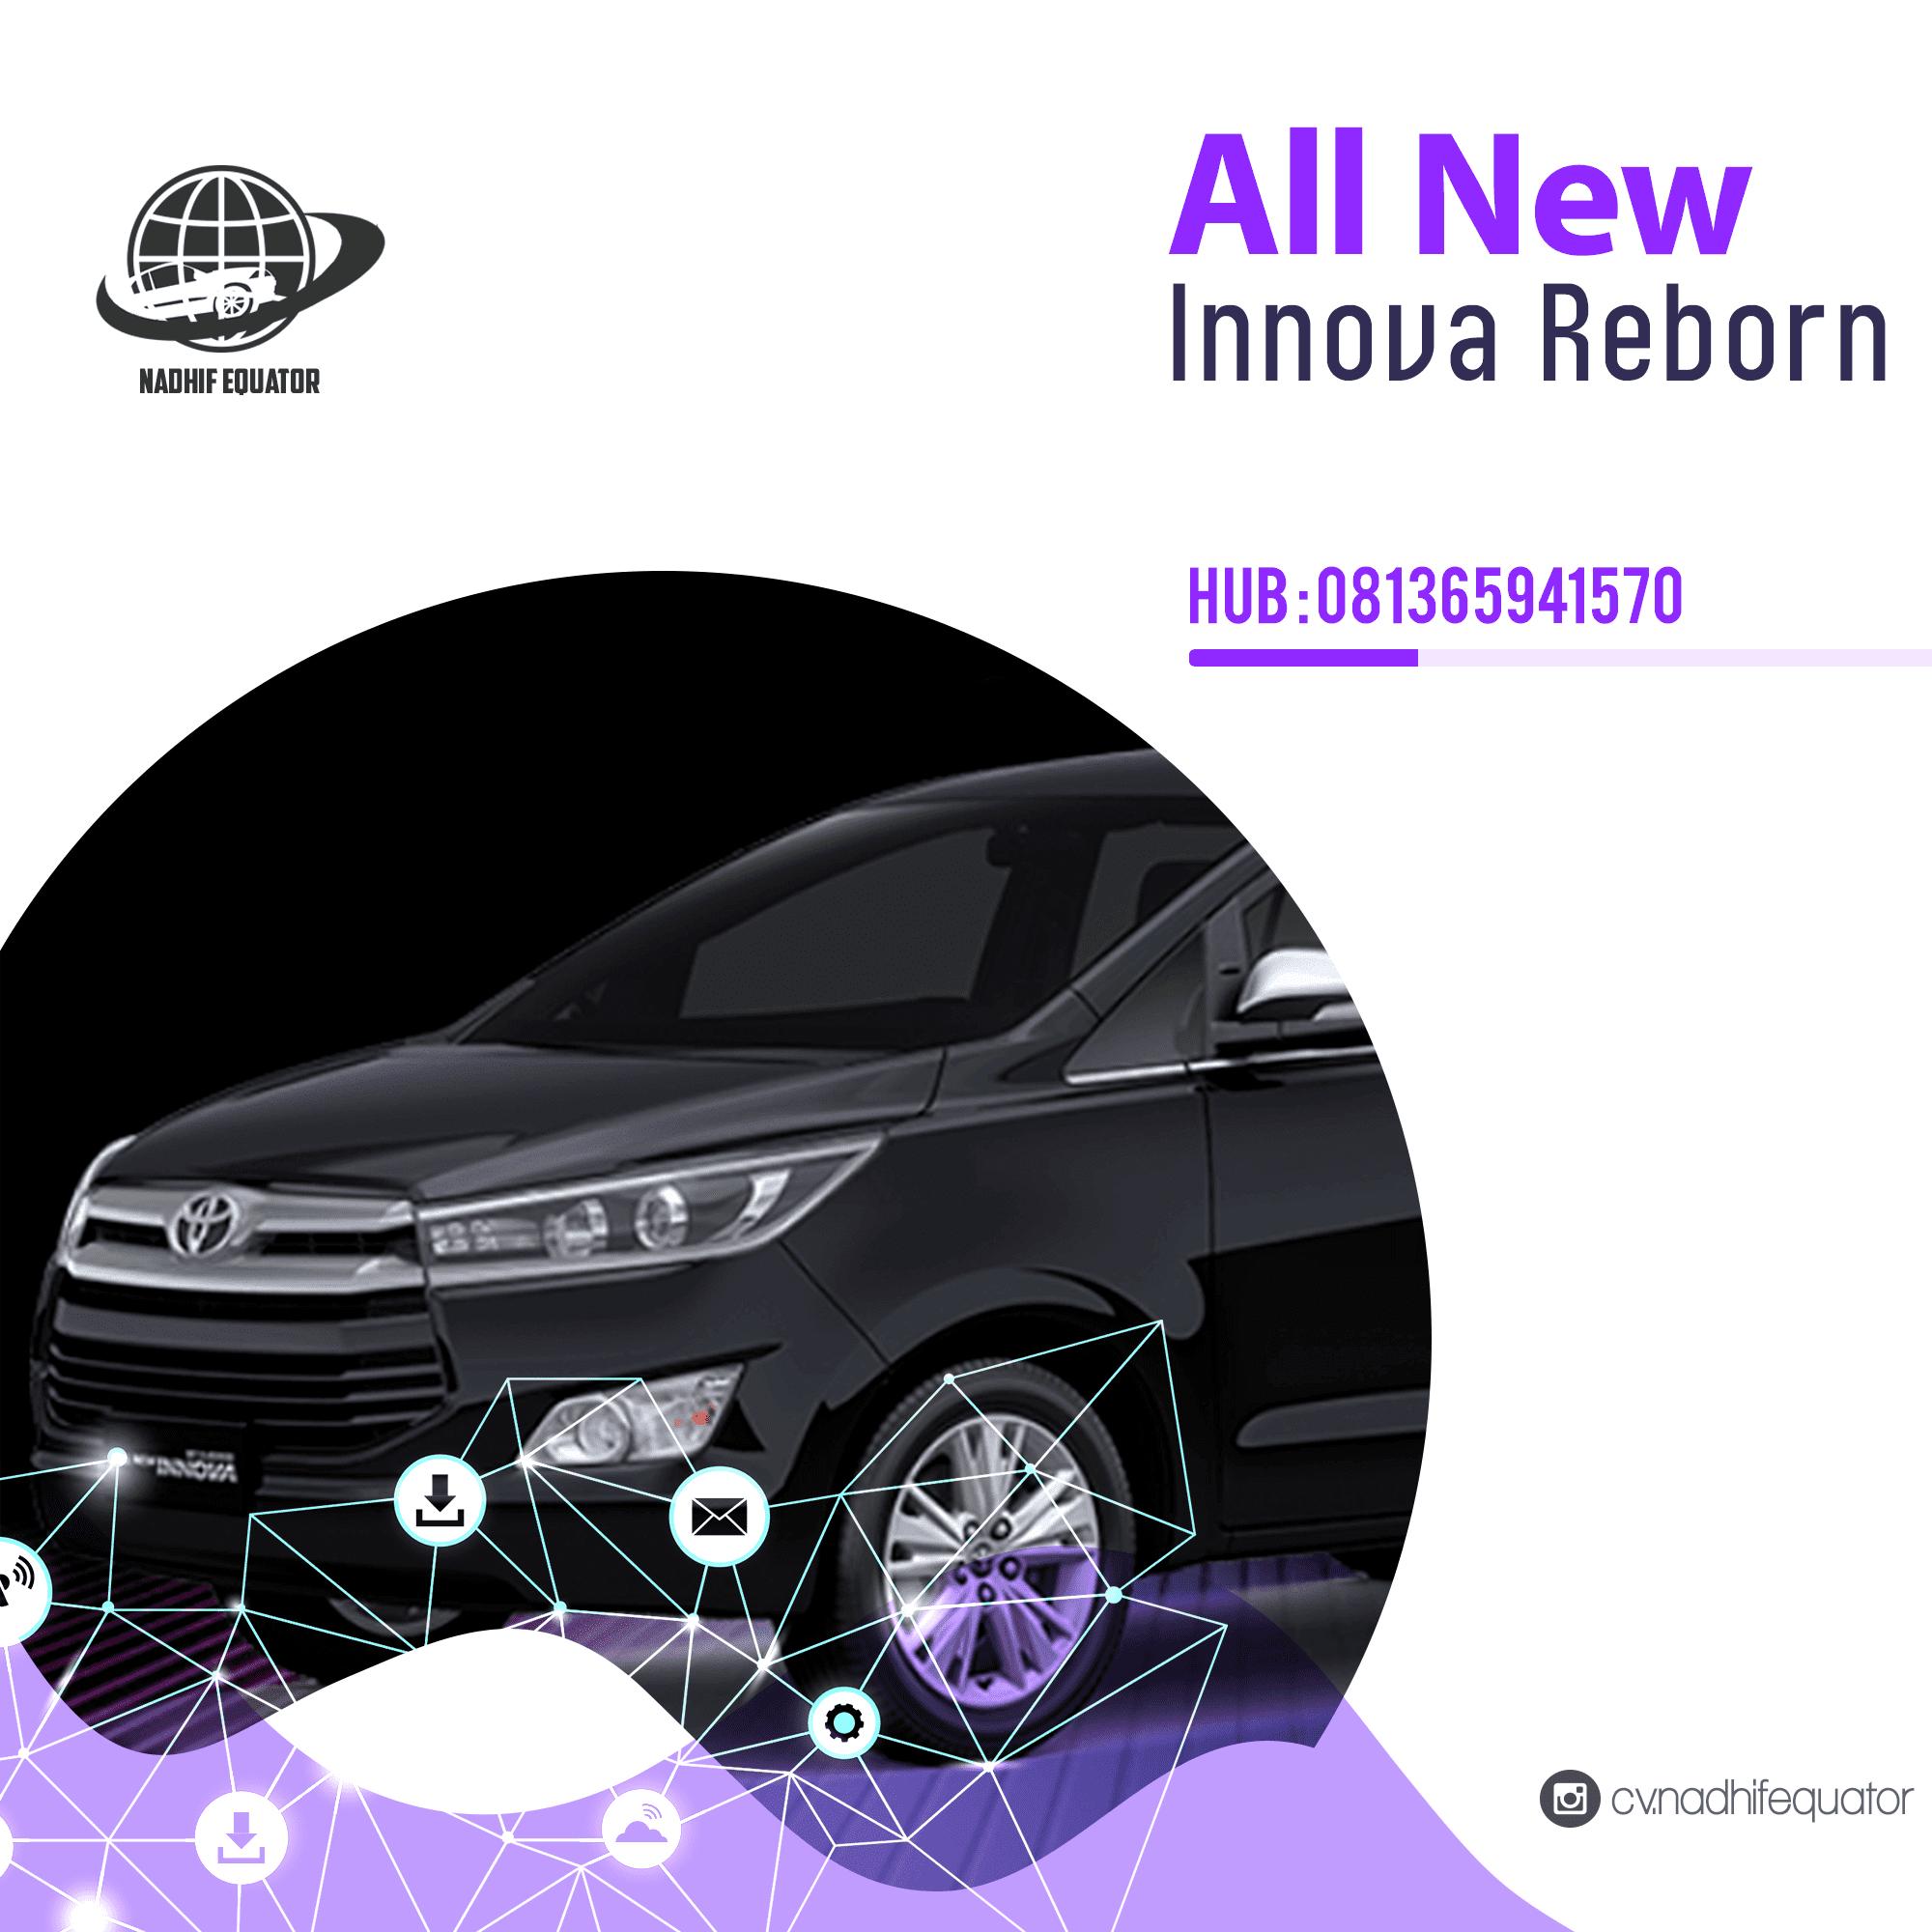 Rental Mobil Innova Reborn Pekanbaru Mobil